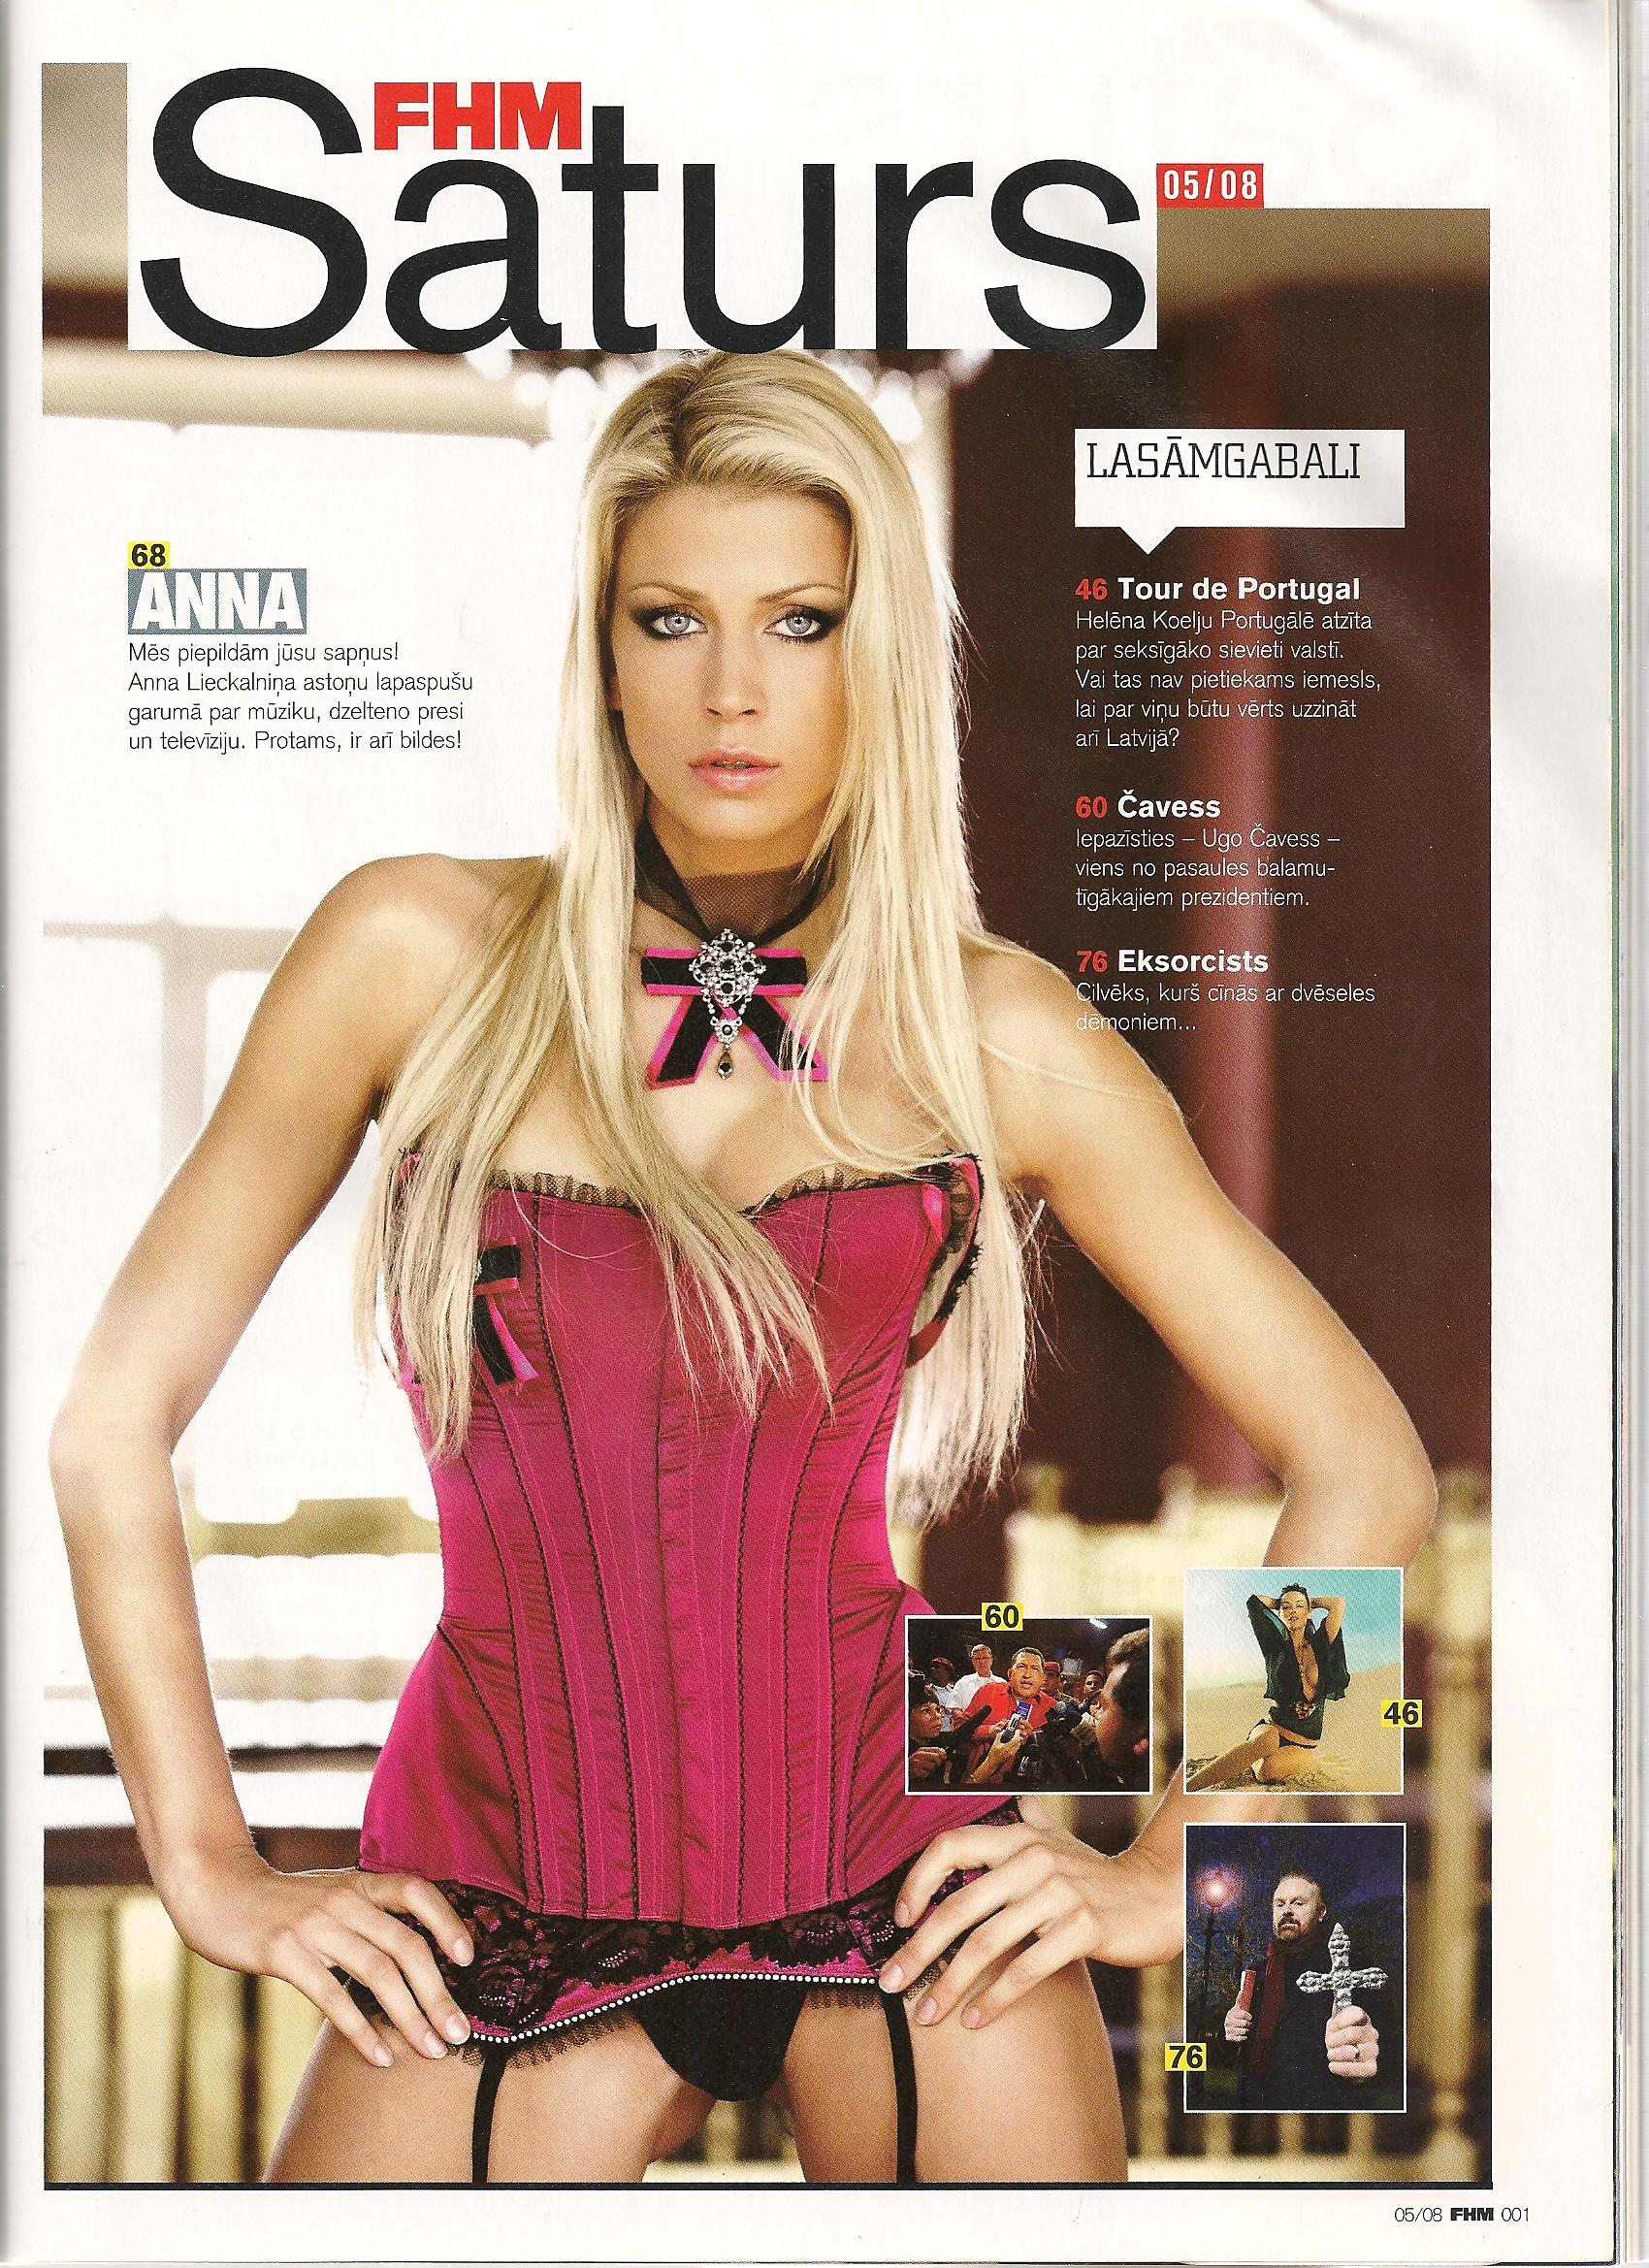 Anna Lieckalniņa, FHM feature